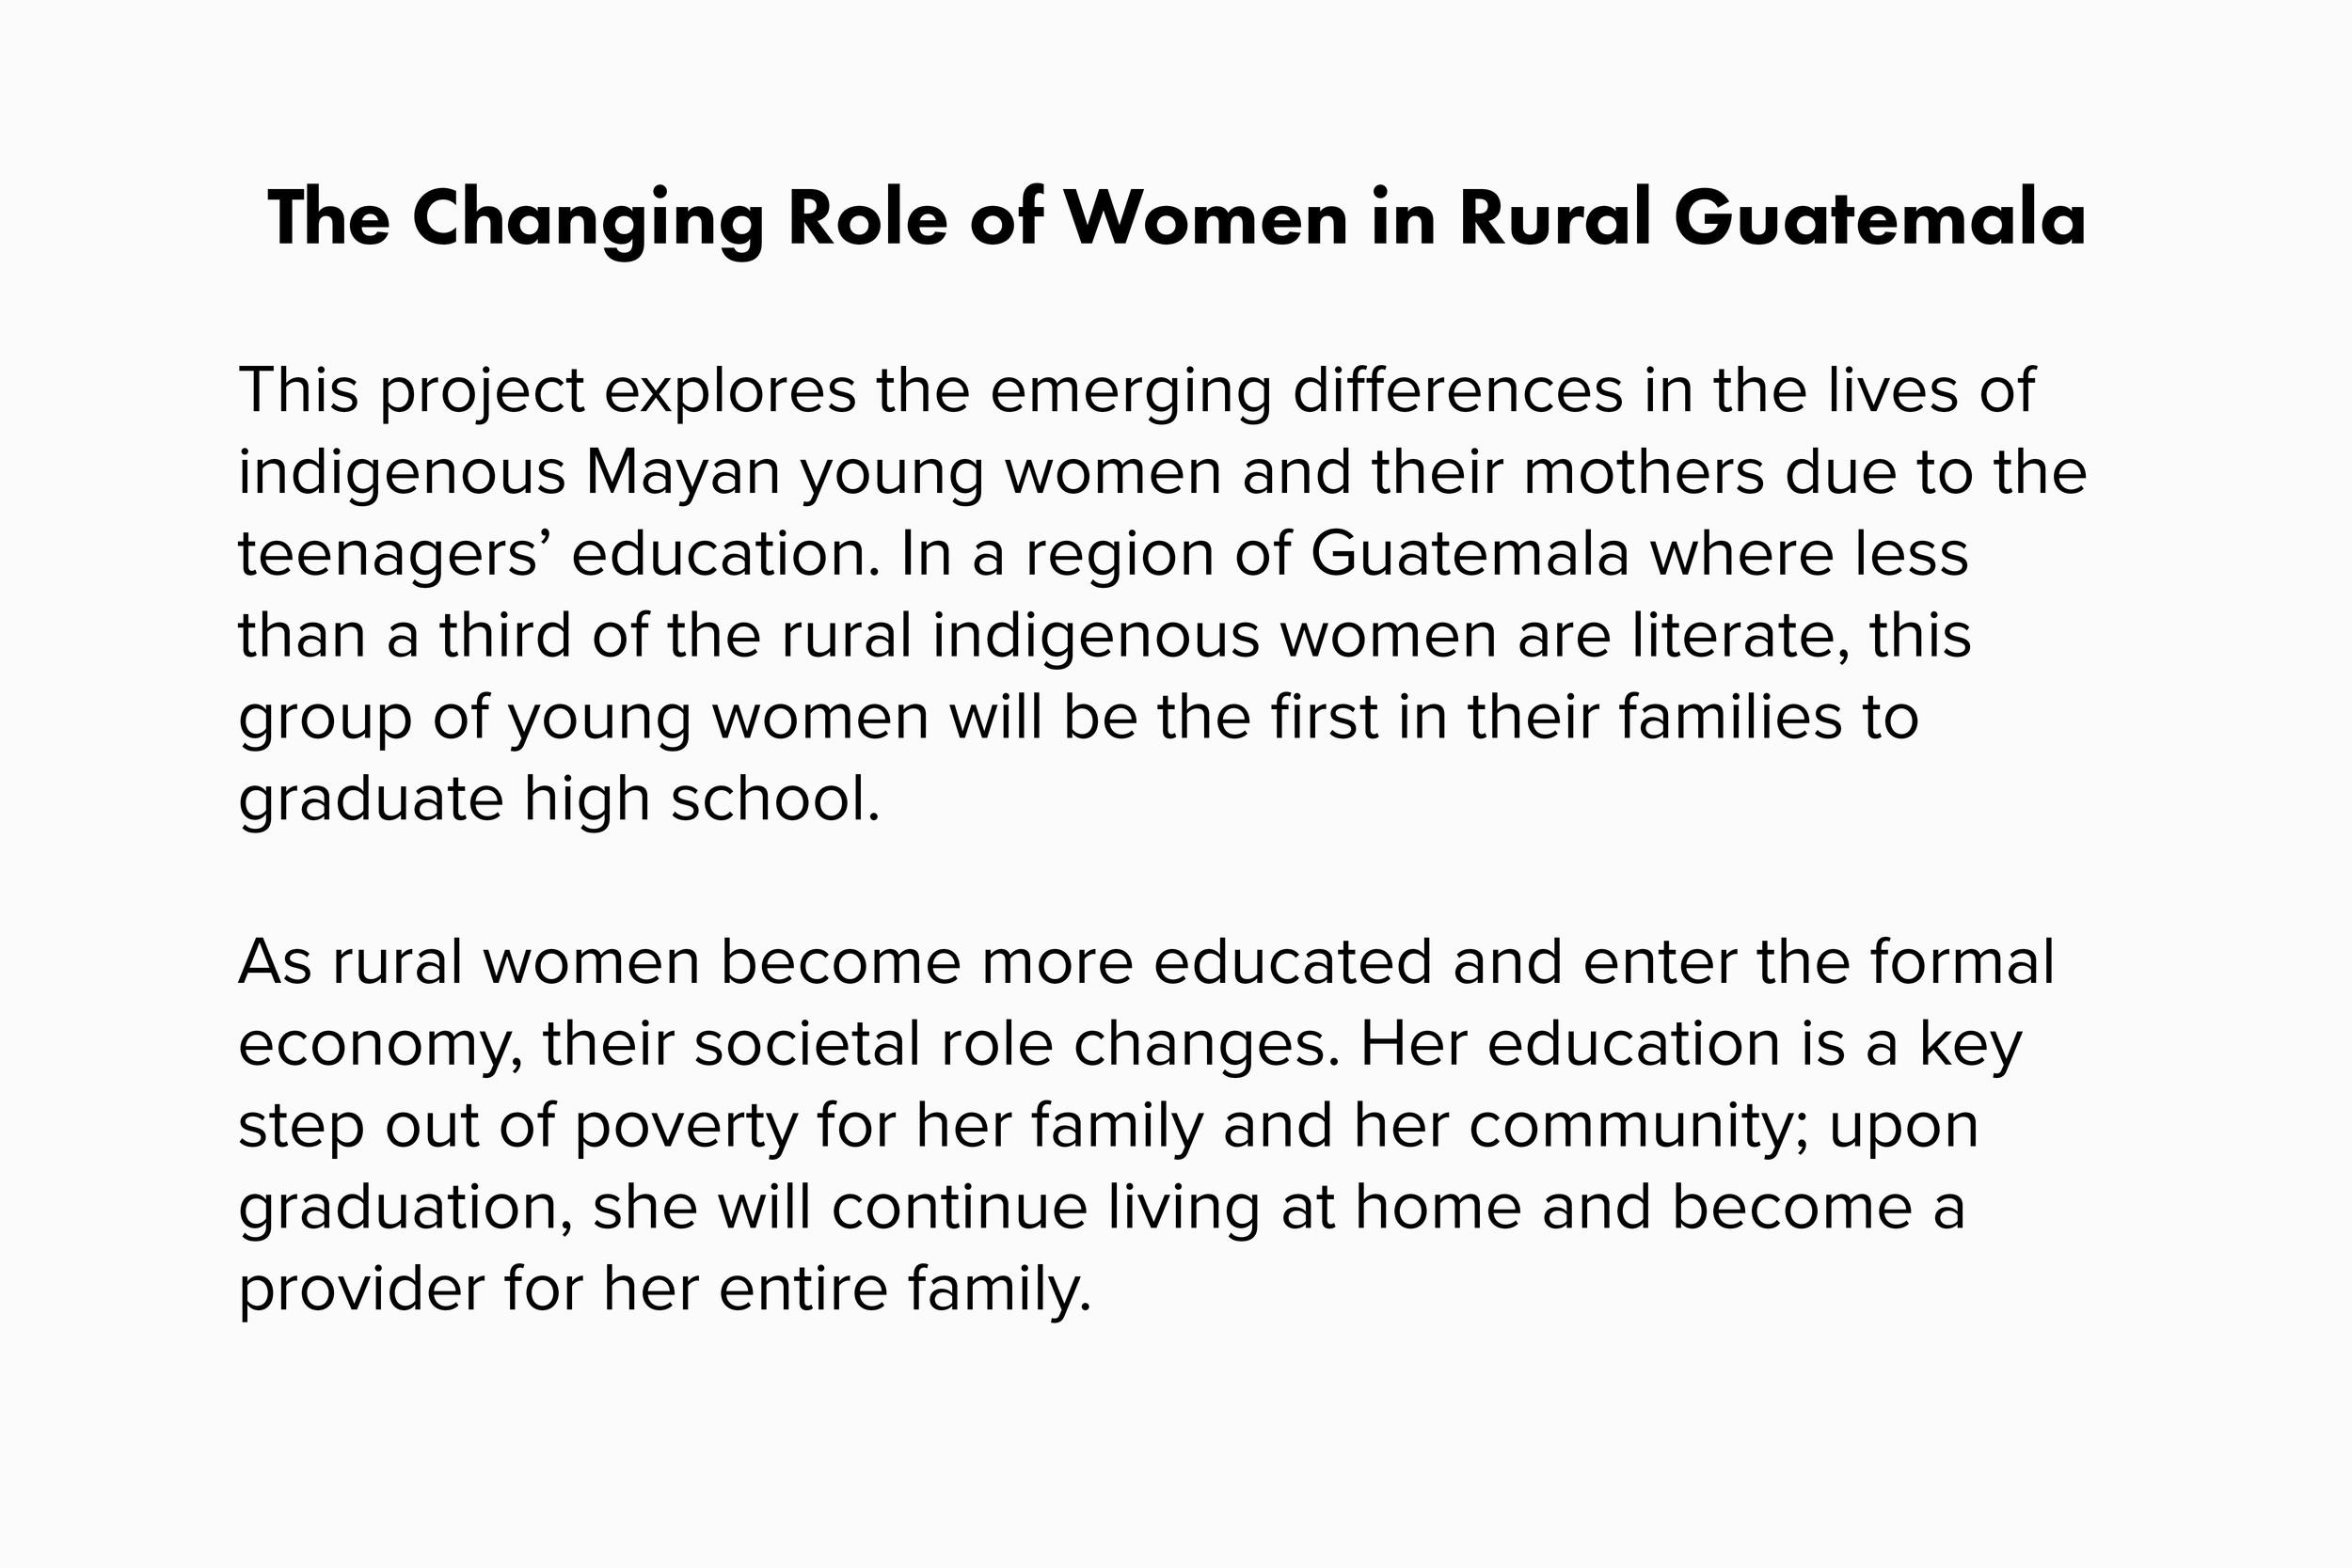 Guate-description.jpg